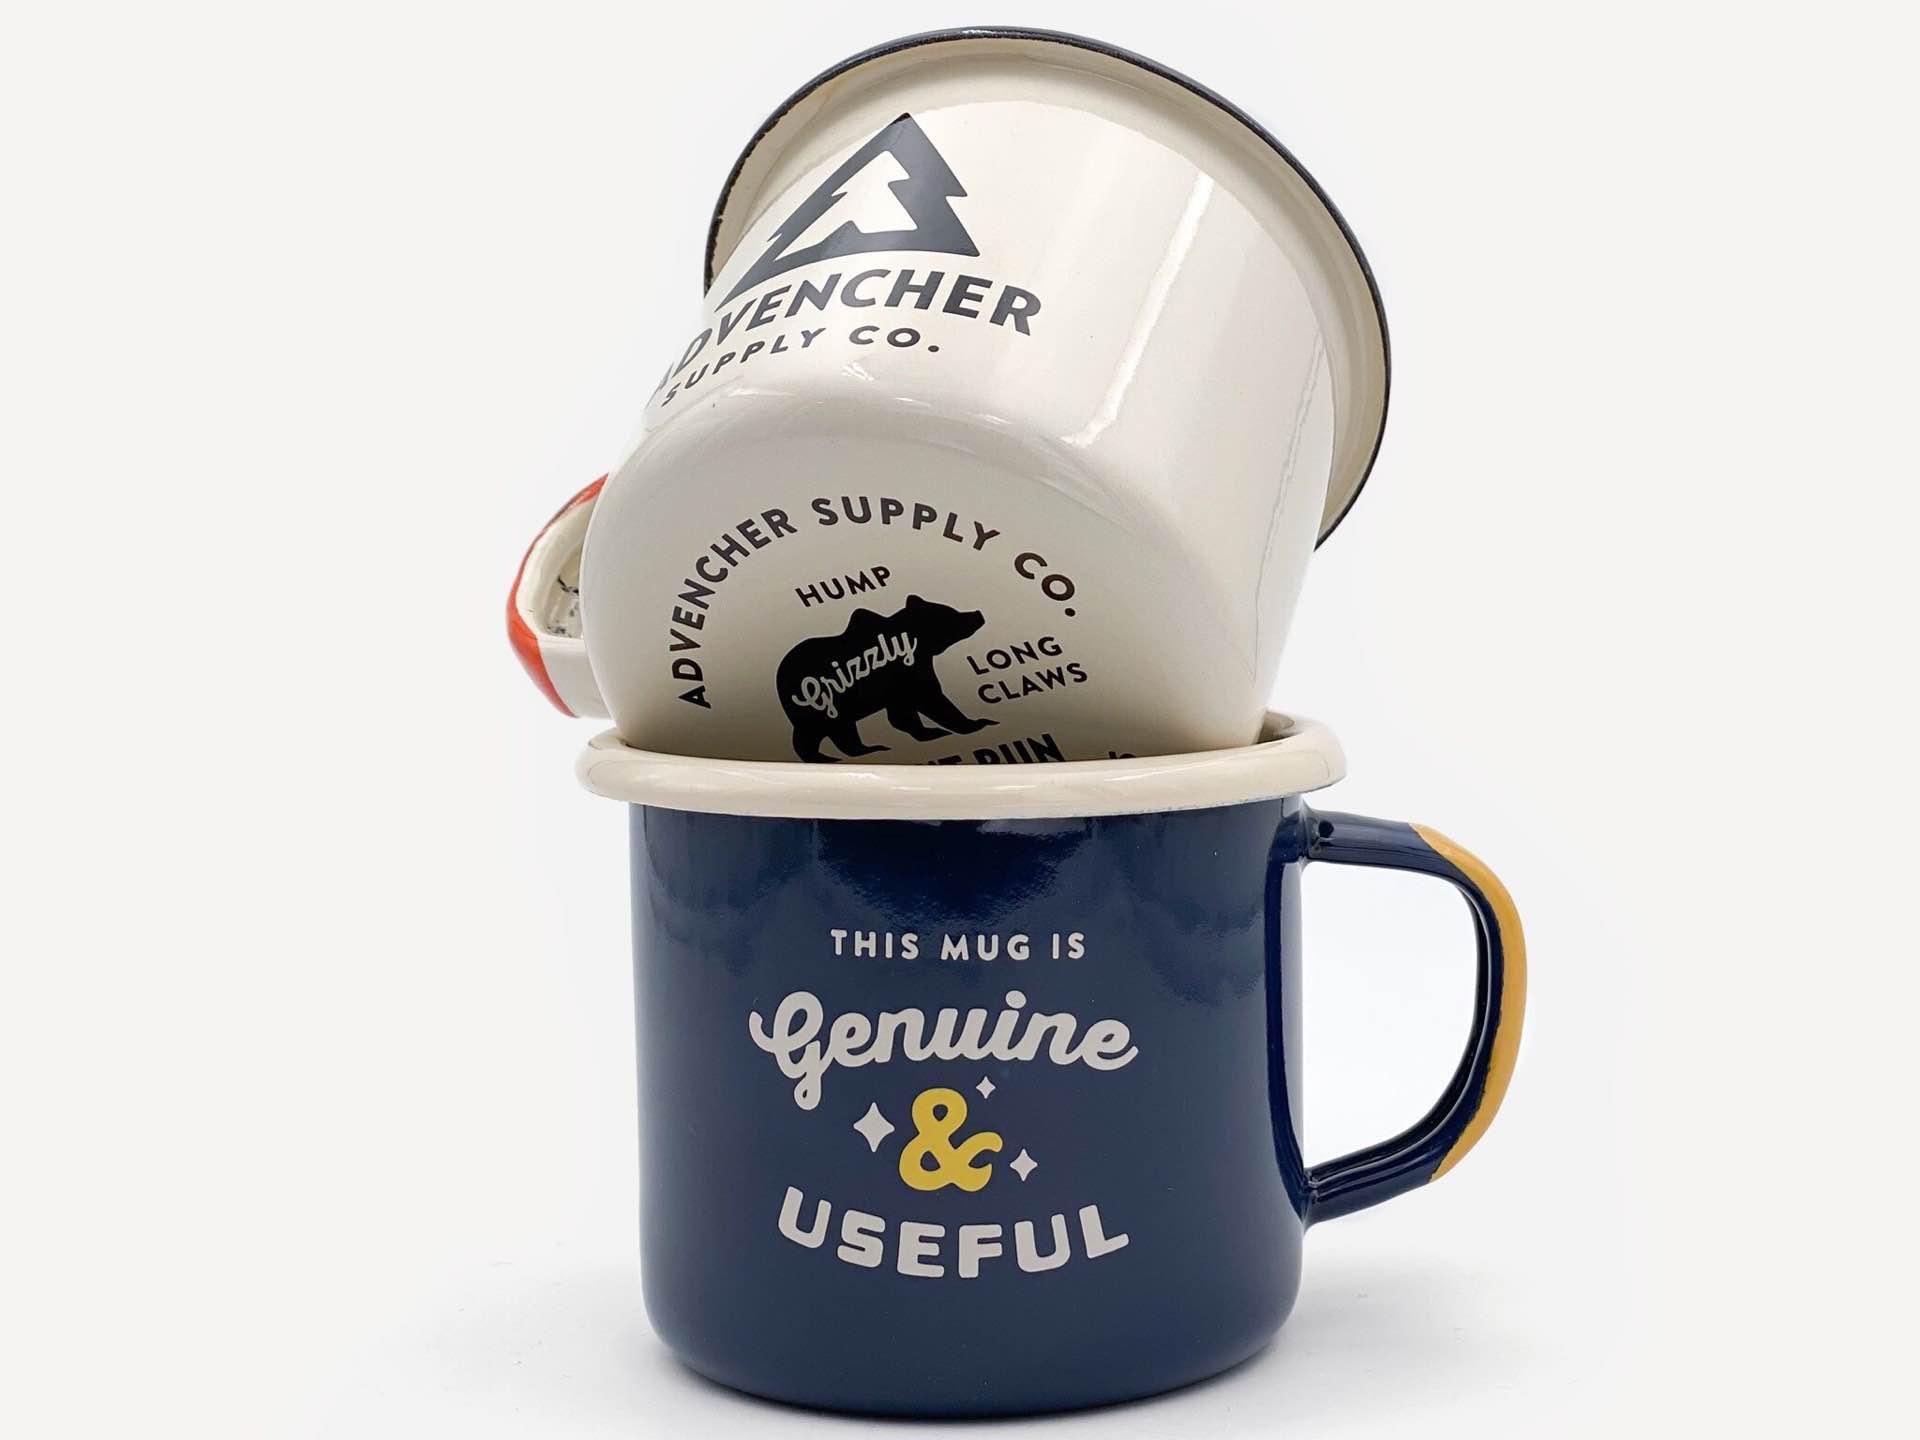 advencher-supply-co-enamel-mugs